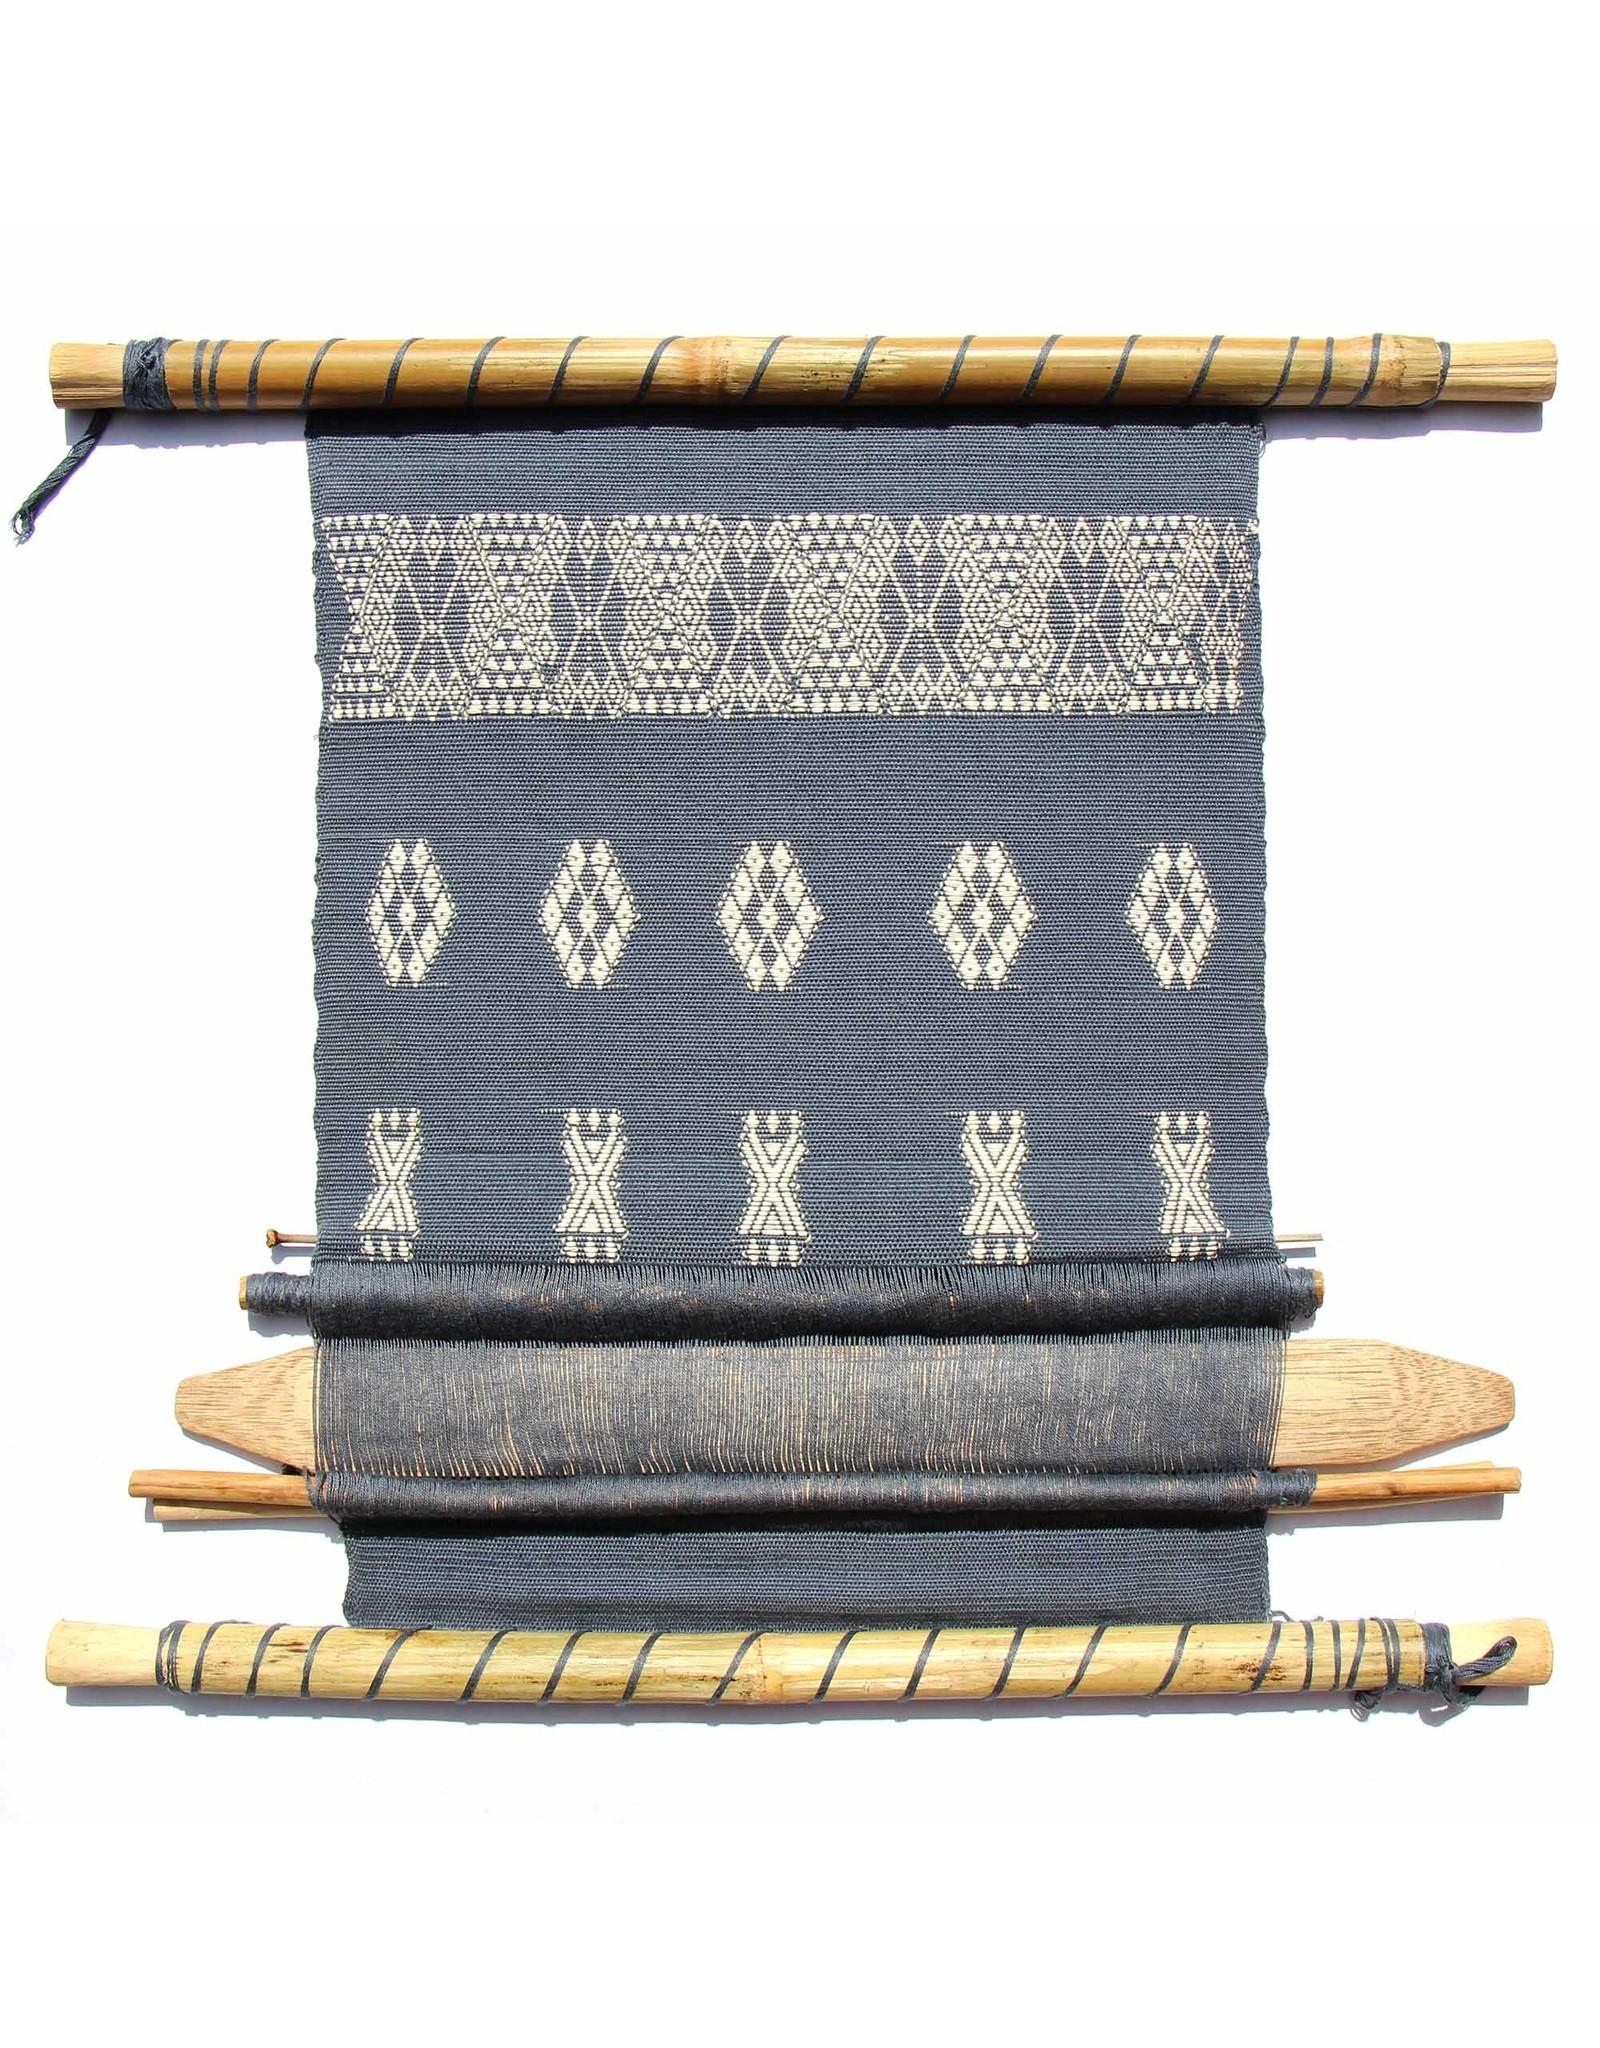 Global Crafts Handloom Wall Tapestry, Blue & White. Guatemala